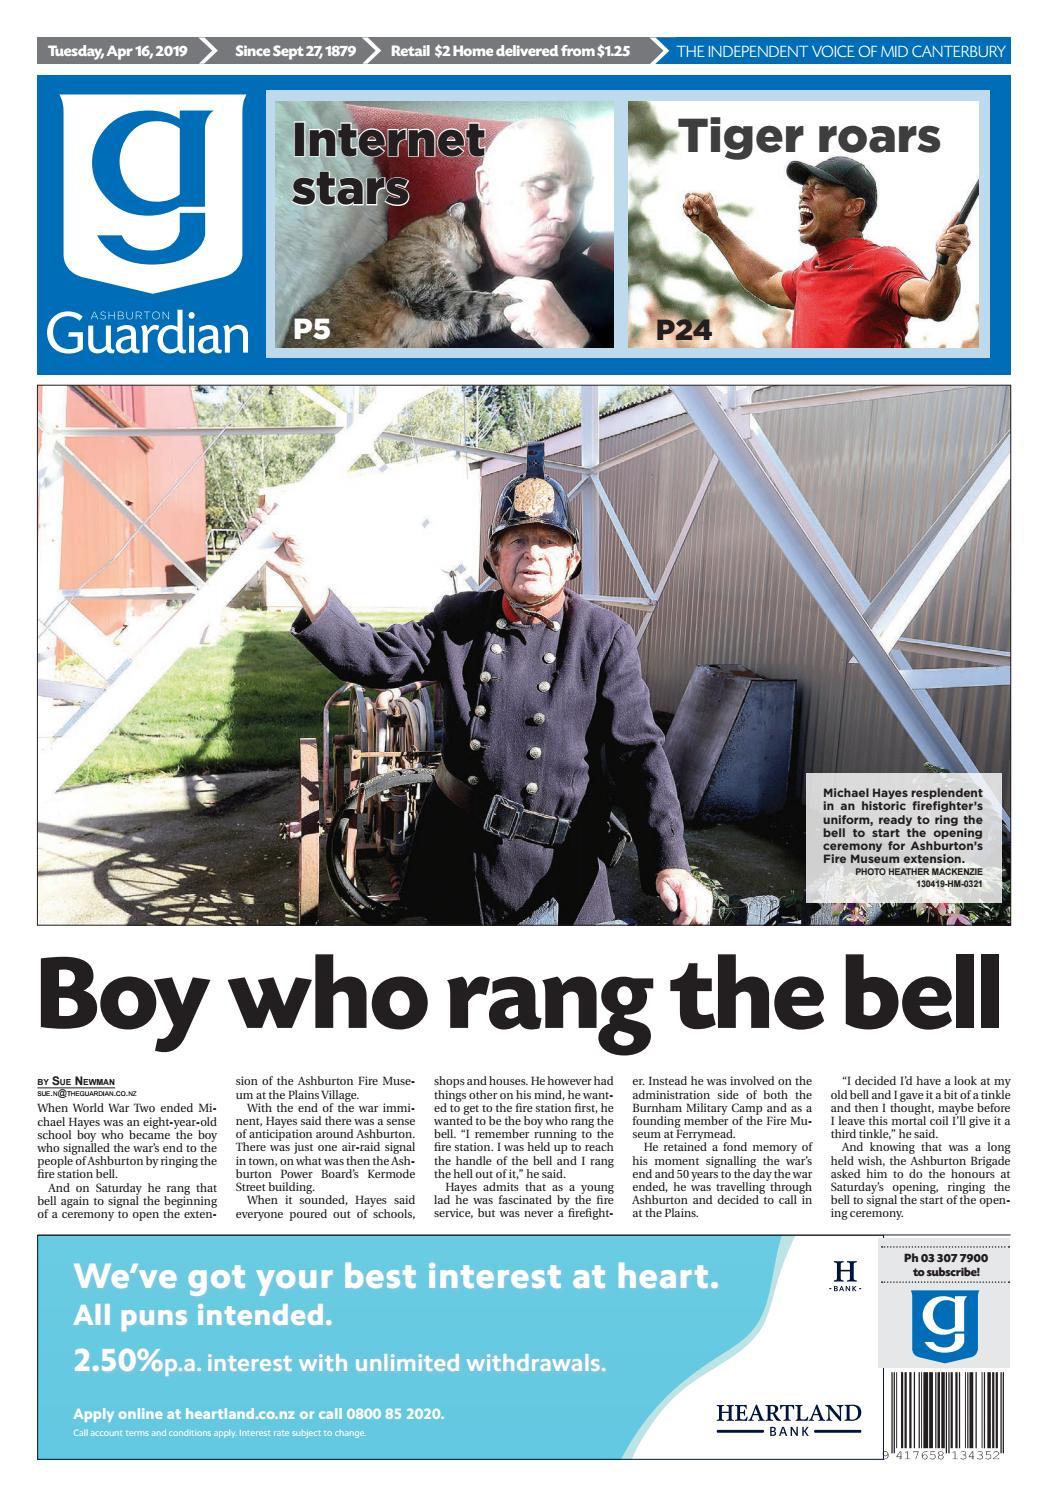 Ashburton Guardian, Tuesday, April 16, 2019 by Ashburton